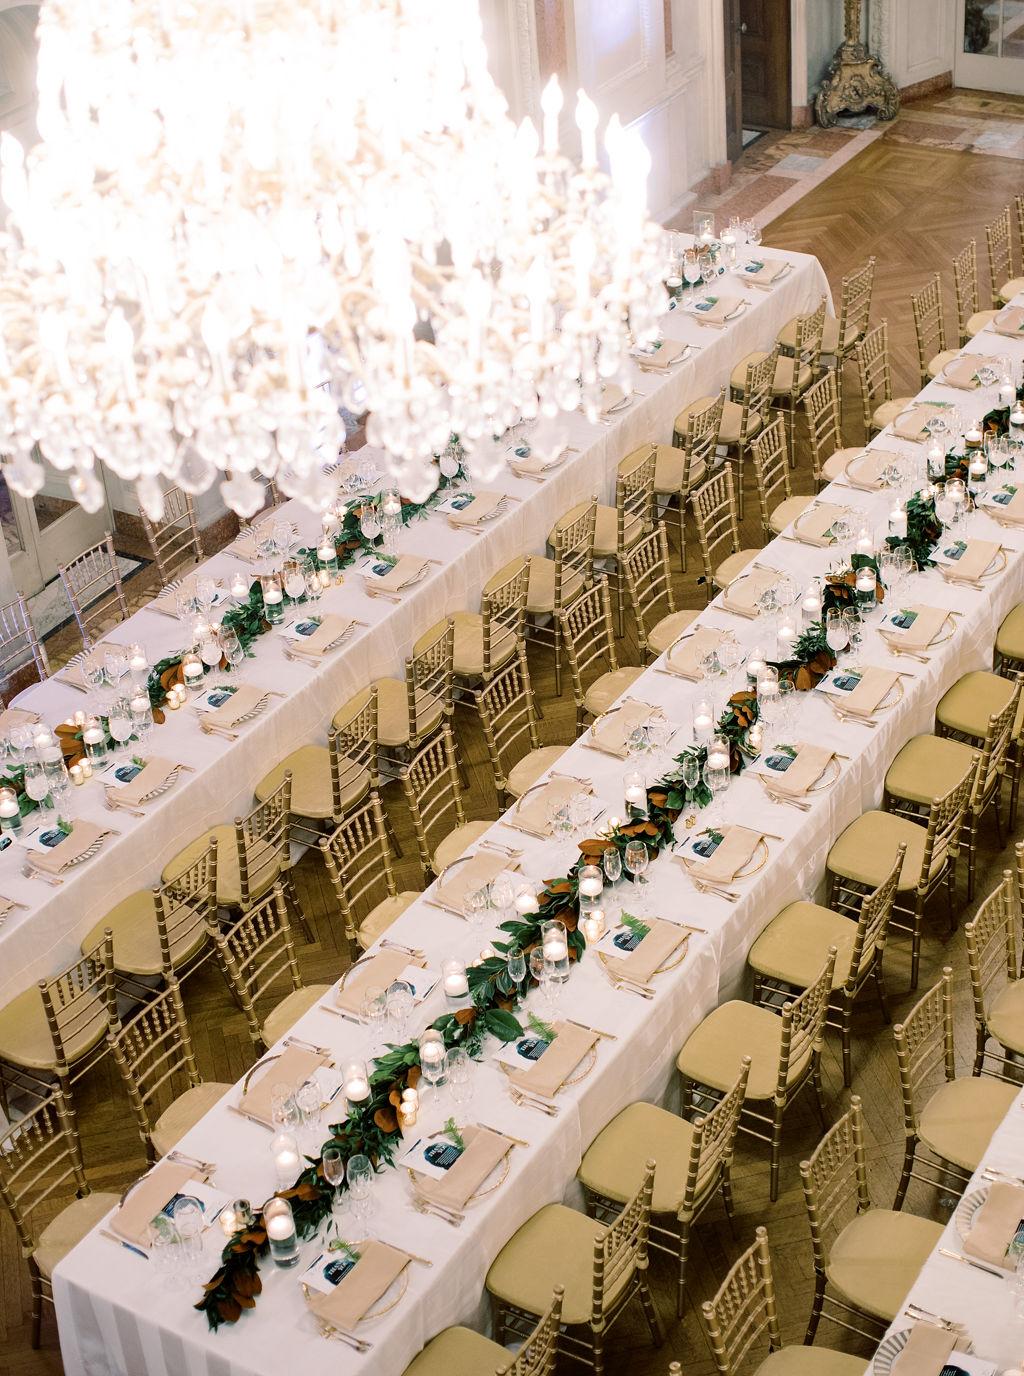 megan henock wedding reception long tables from above